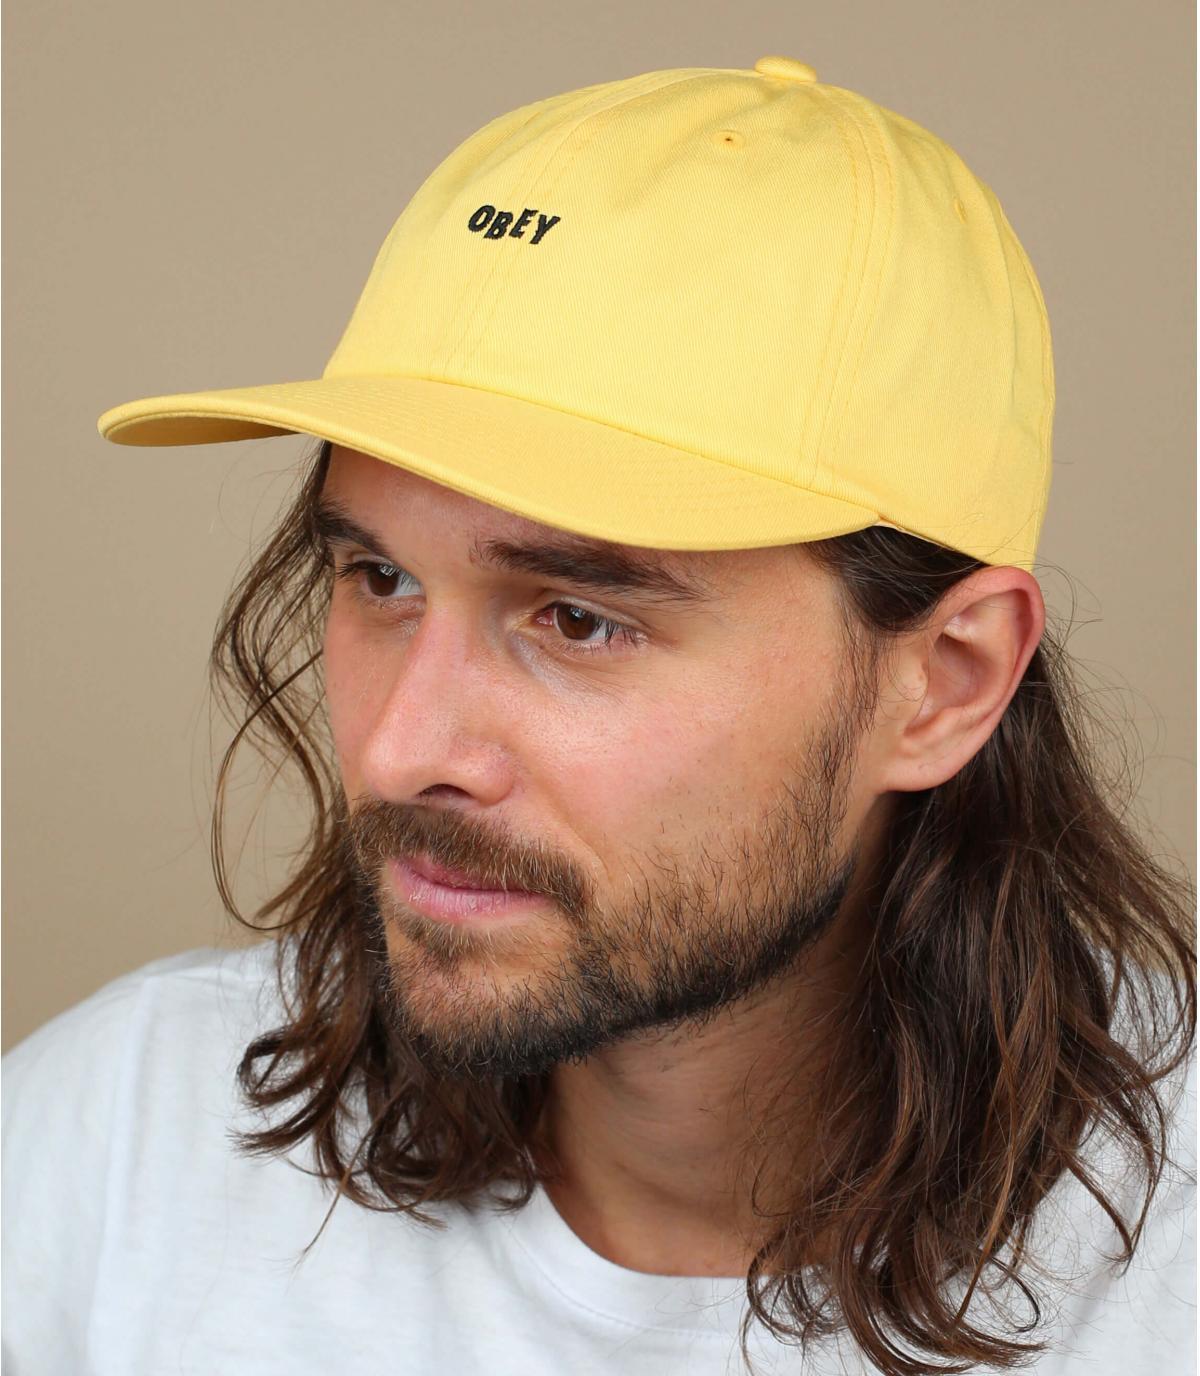 casquette Obey jaune